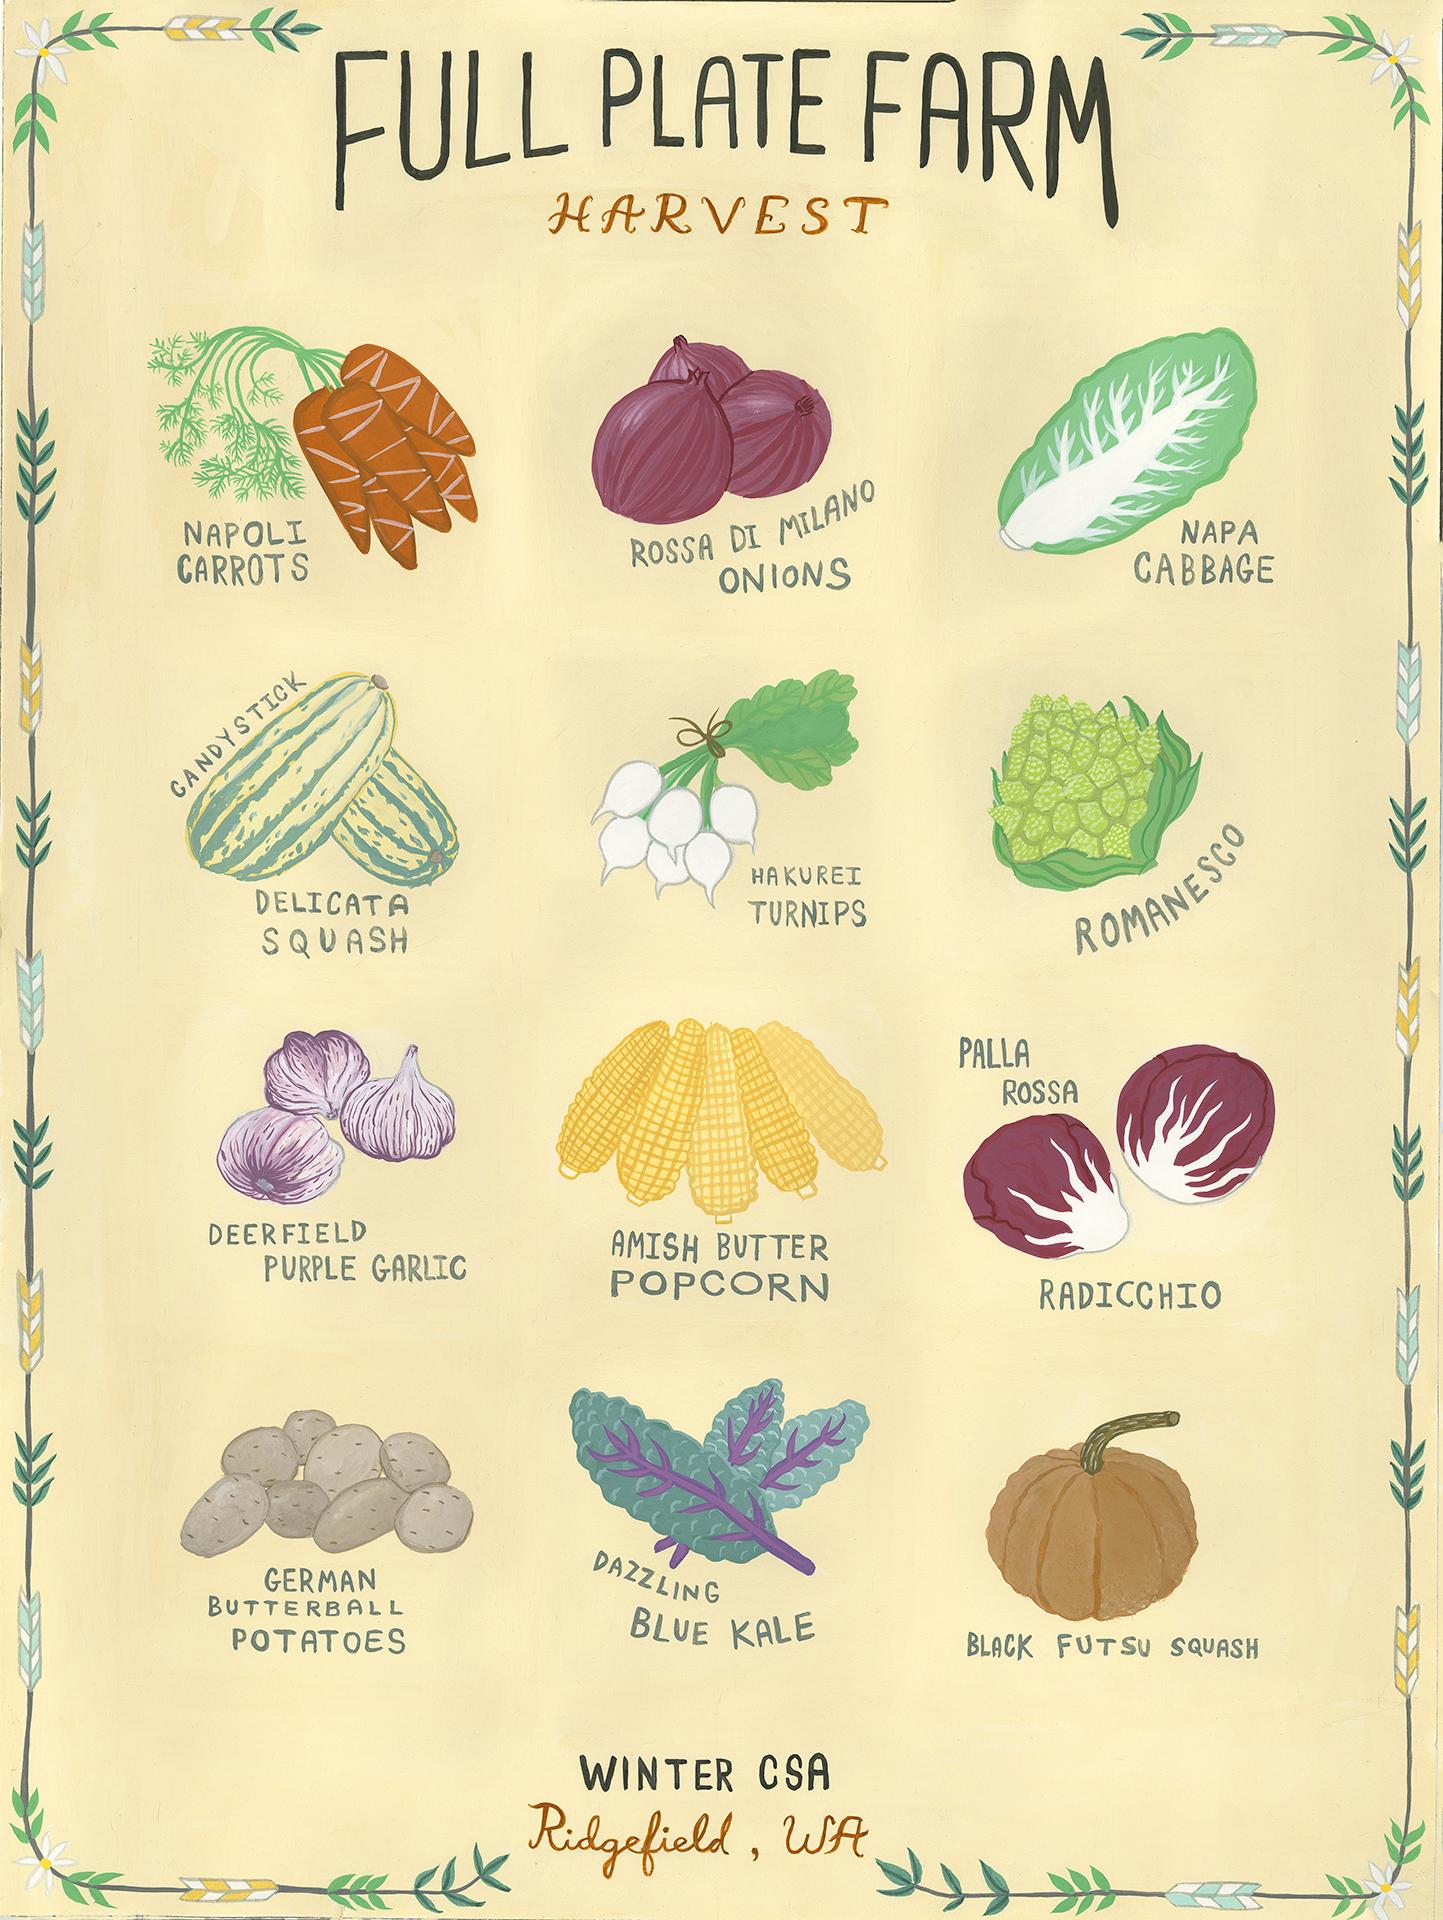 Full Plate Farm - Illustrated Farm Journal